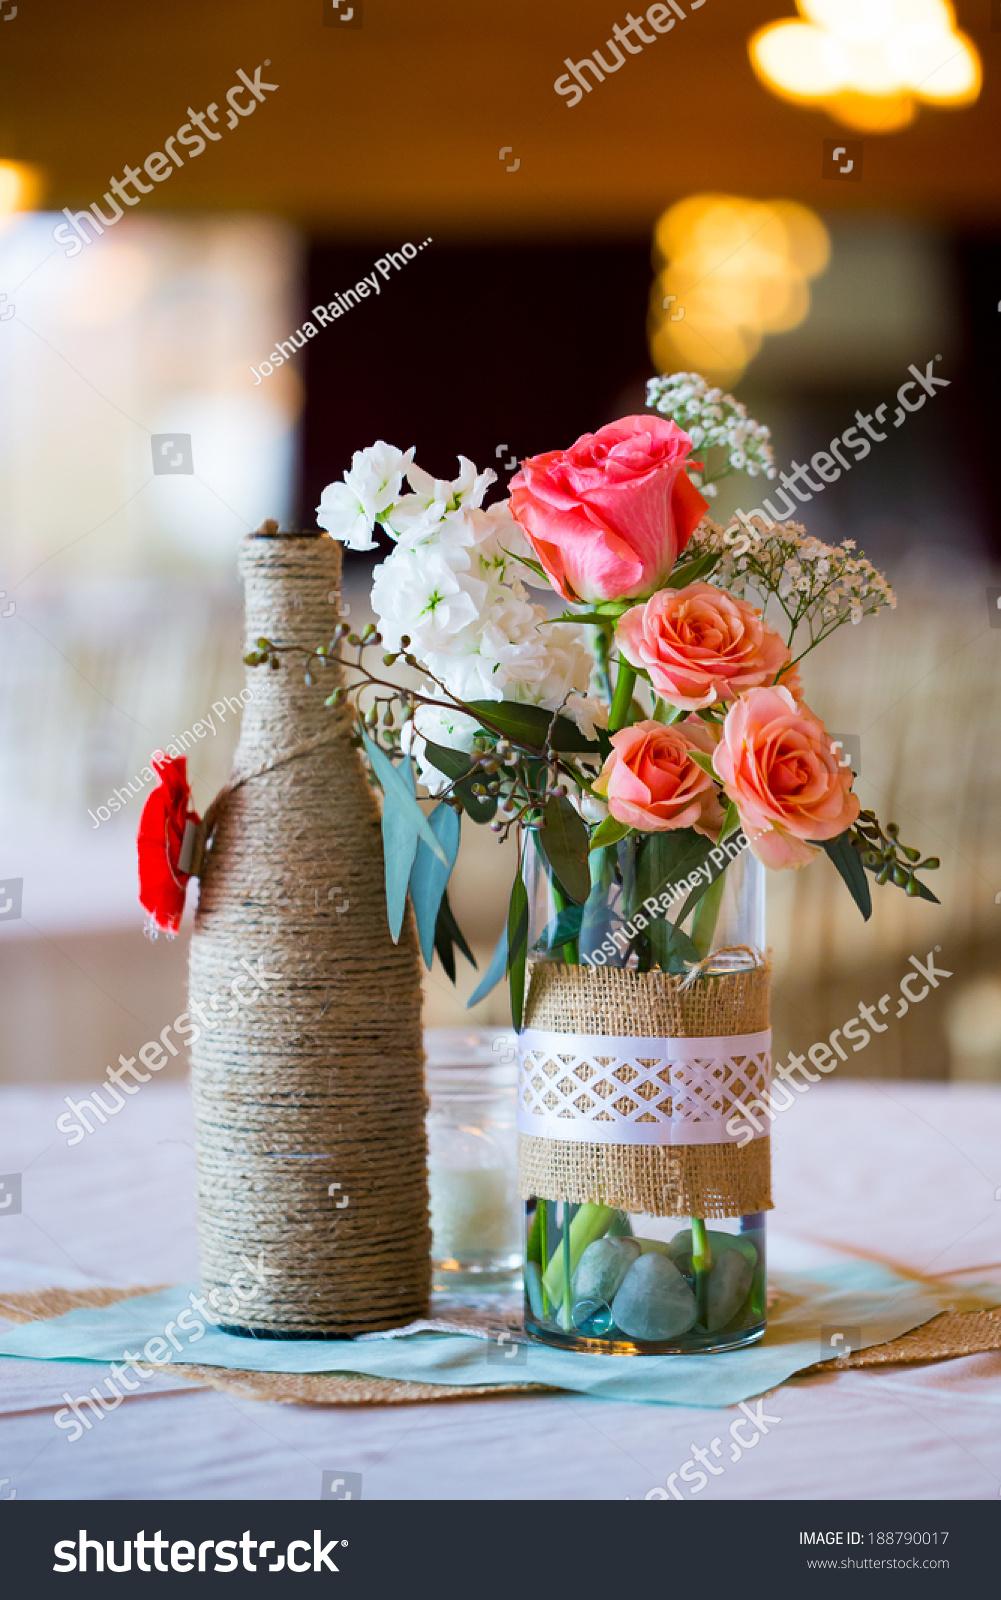 Diy Wedding Decor Table Centerpieces Wine Stock Photo (Edit Now) 188790017